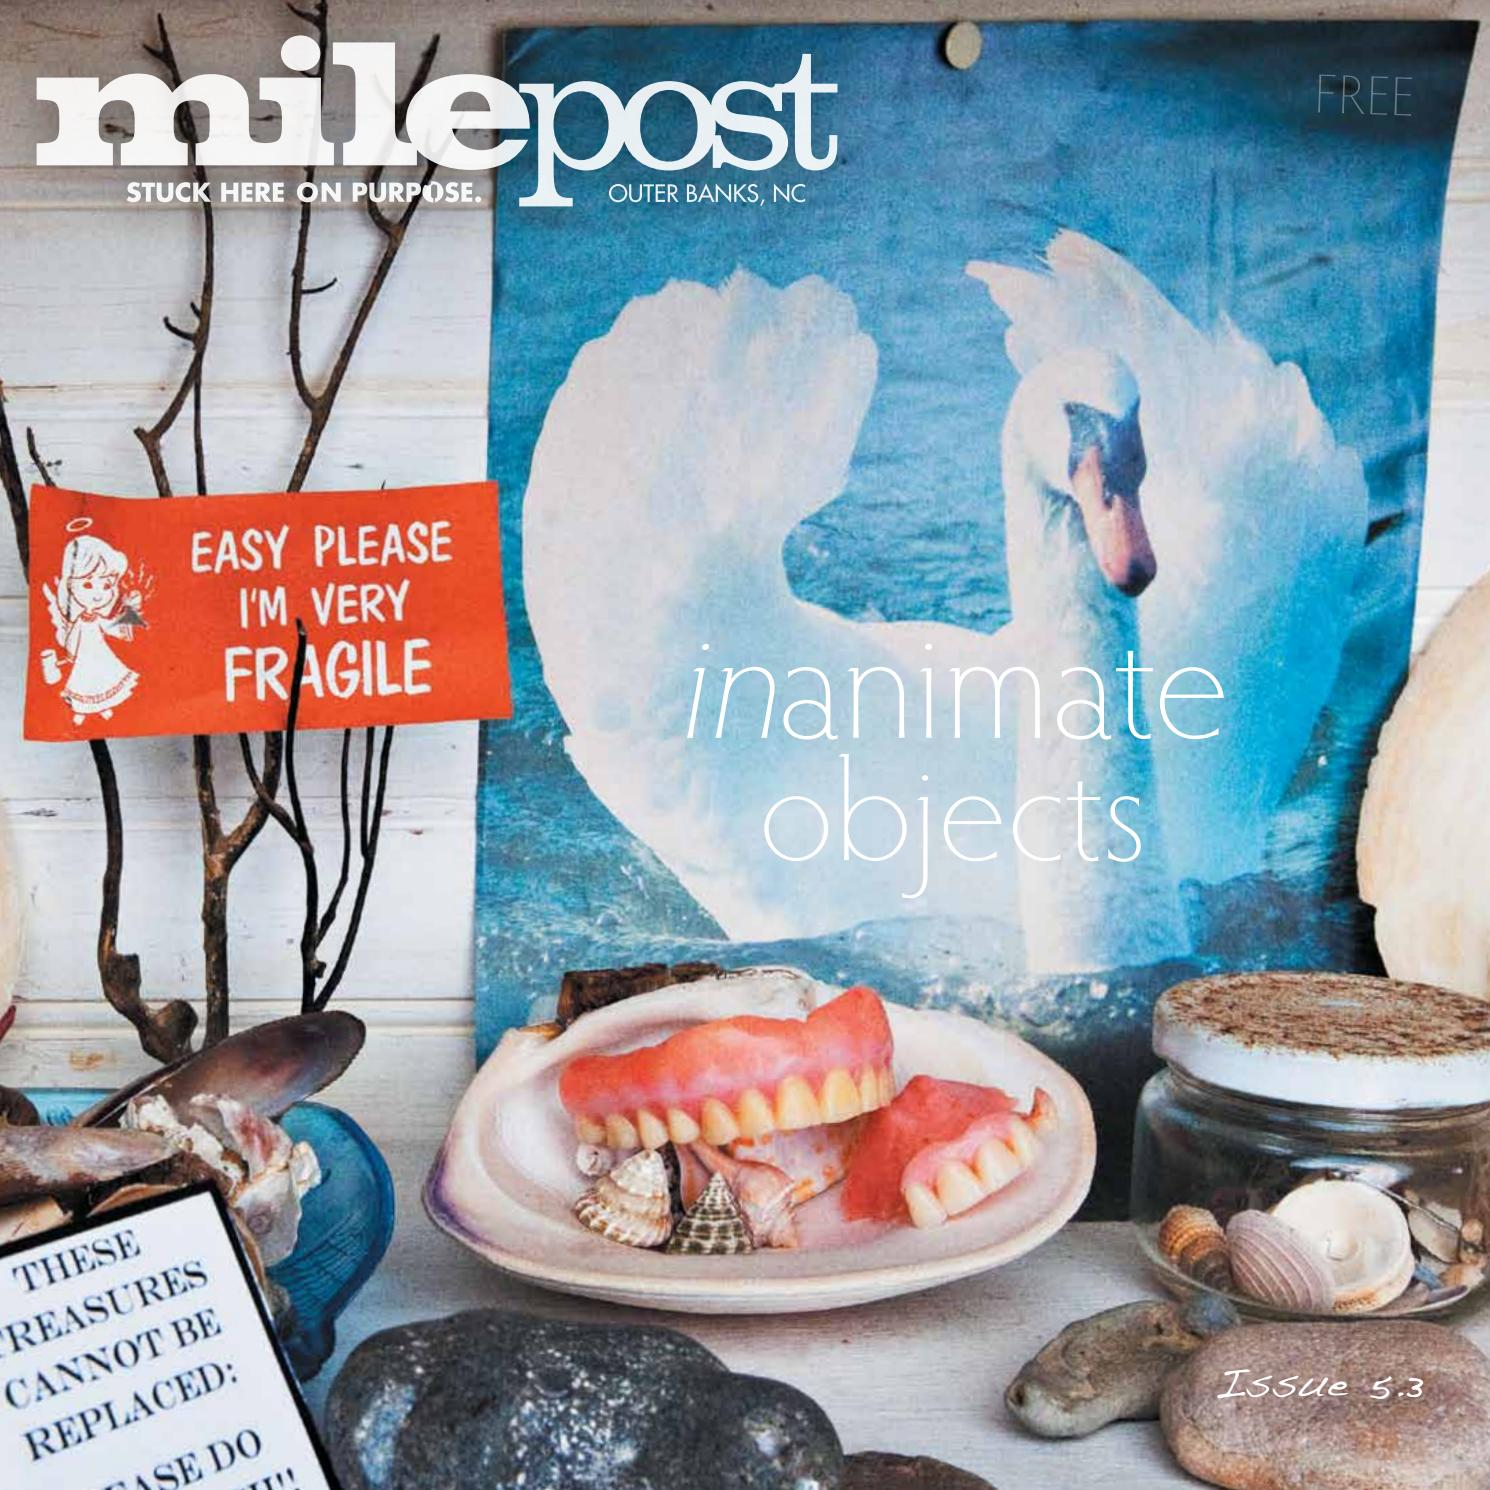 OUTER BANKS MILEPOST ISSUE 53 By Matt Walker